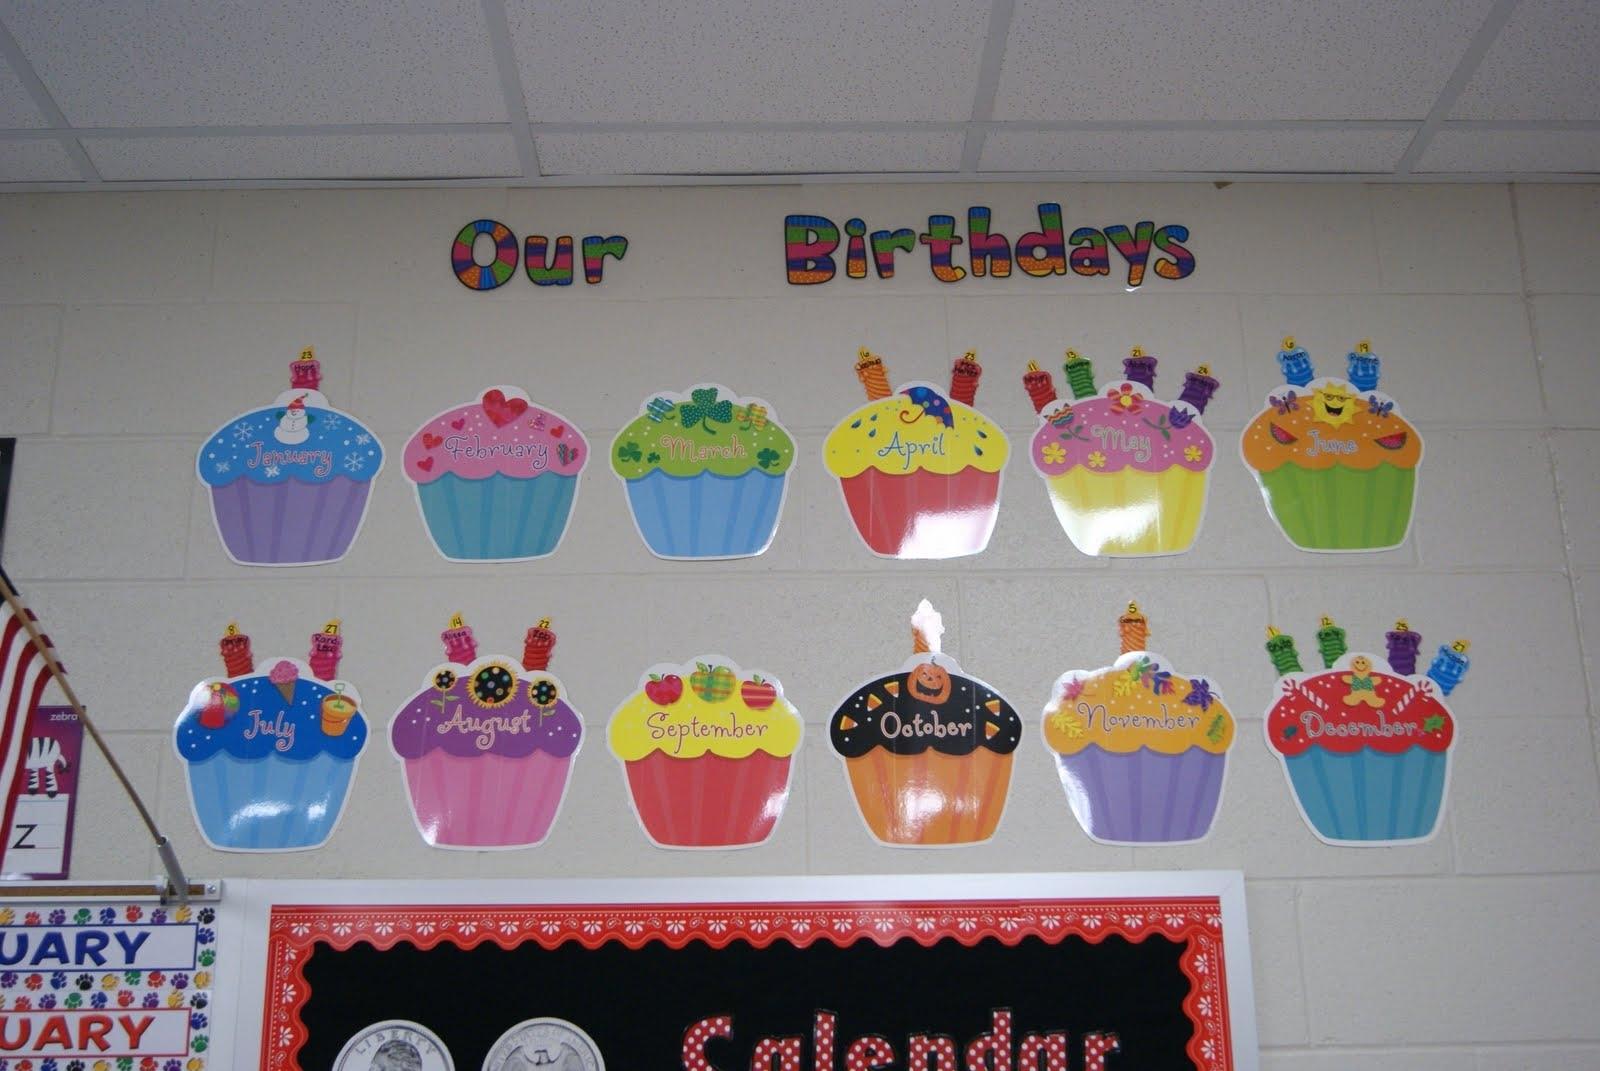 11 Cupcakes For Classroom Birthdays Photo - Cupcake Birthday intended for Cup Cake For Classroom Birthday